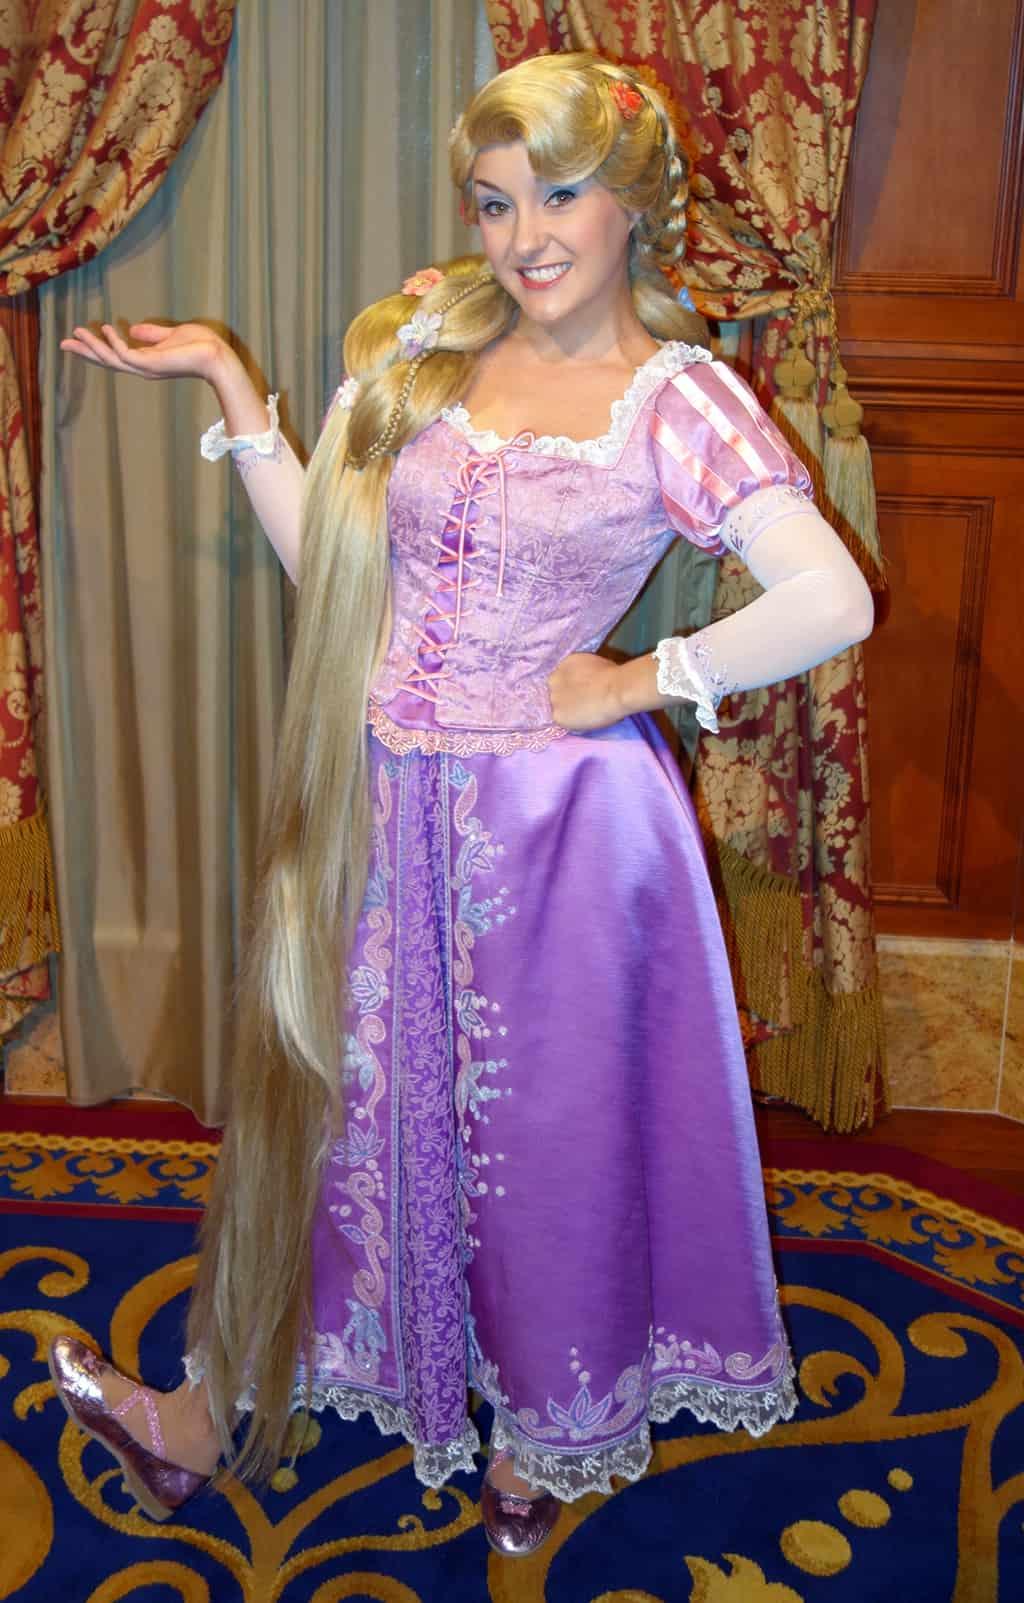 Rapunzel at Princess Fairytale Hall in the Magic Kingdom at Disney World